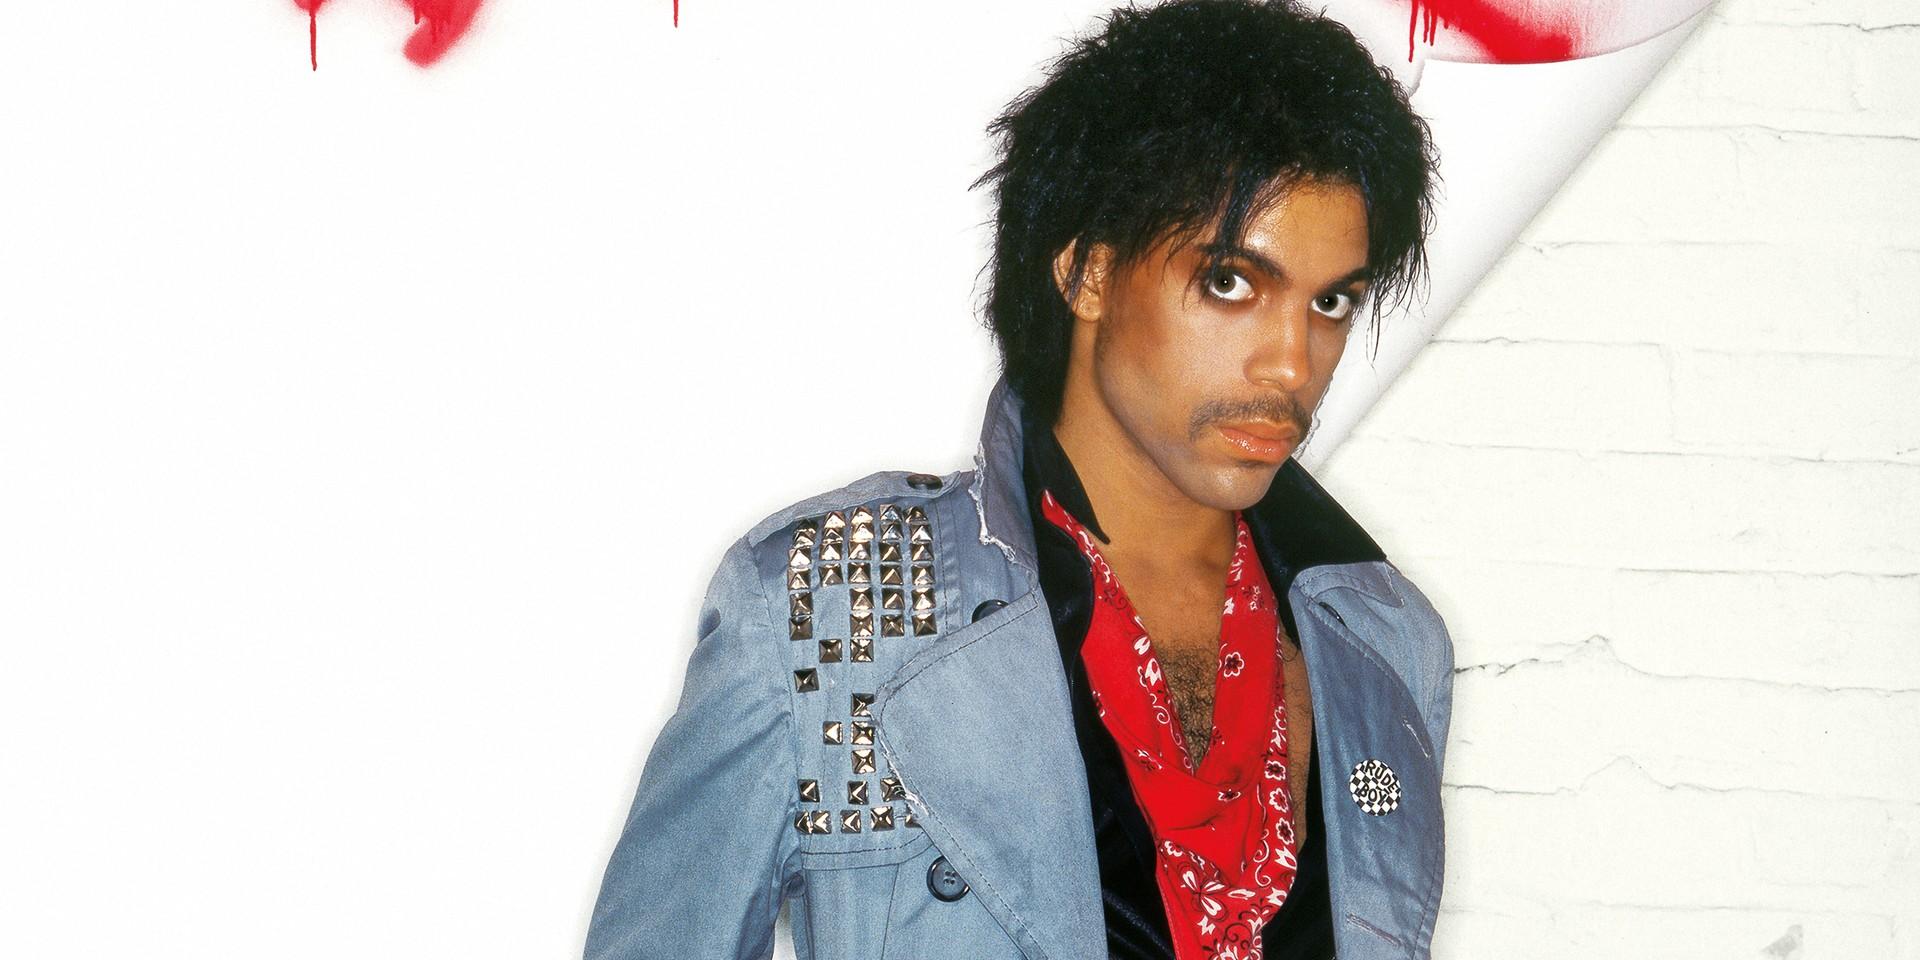 New Prince album consisting of unreleased demos announced